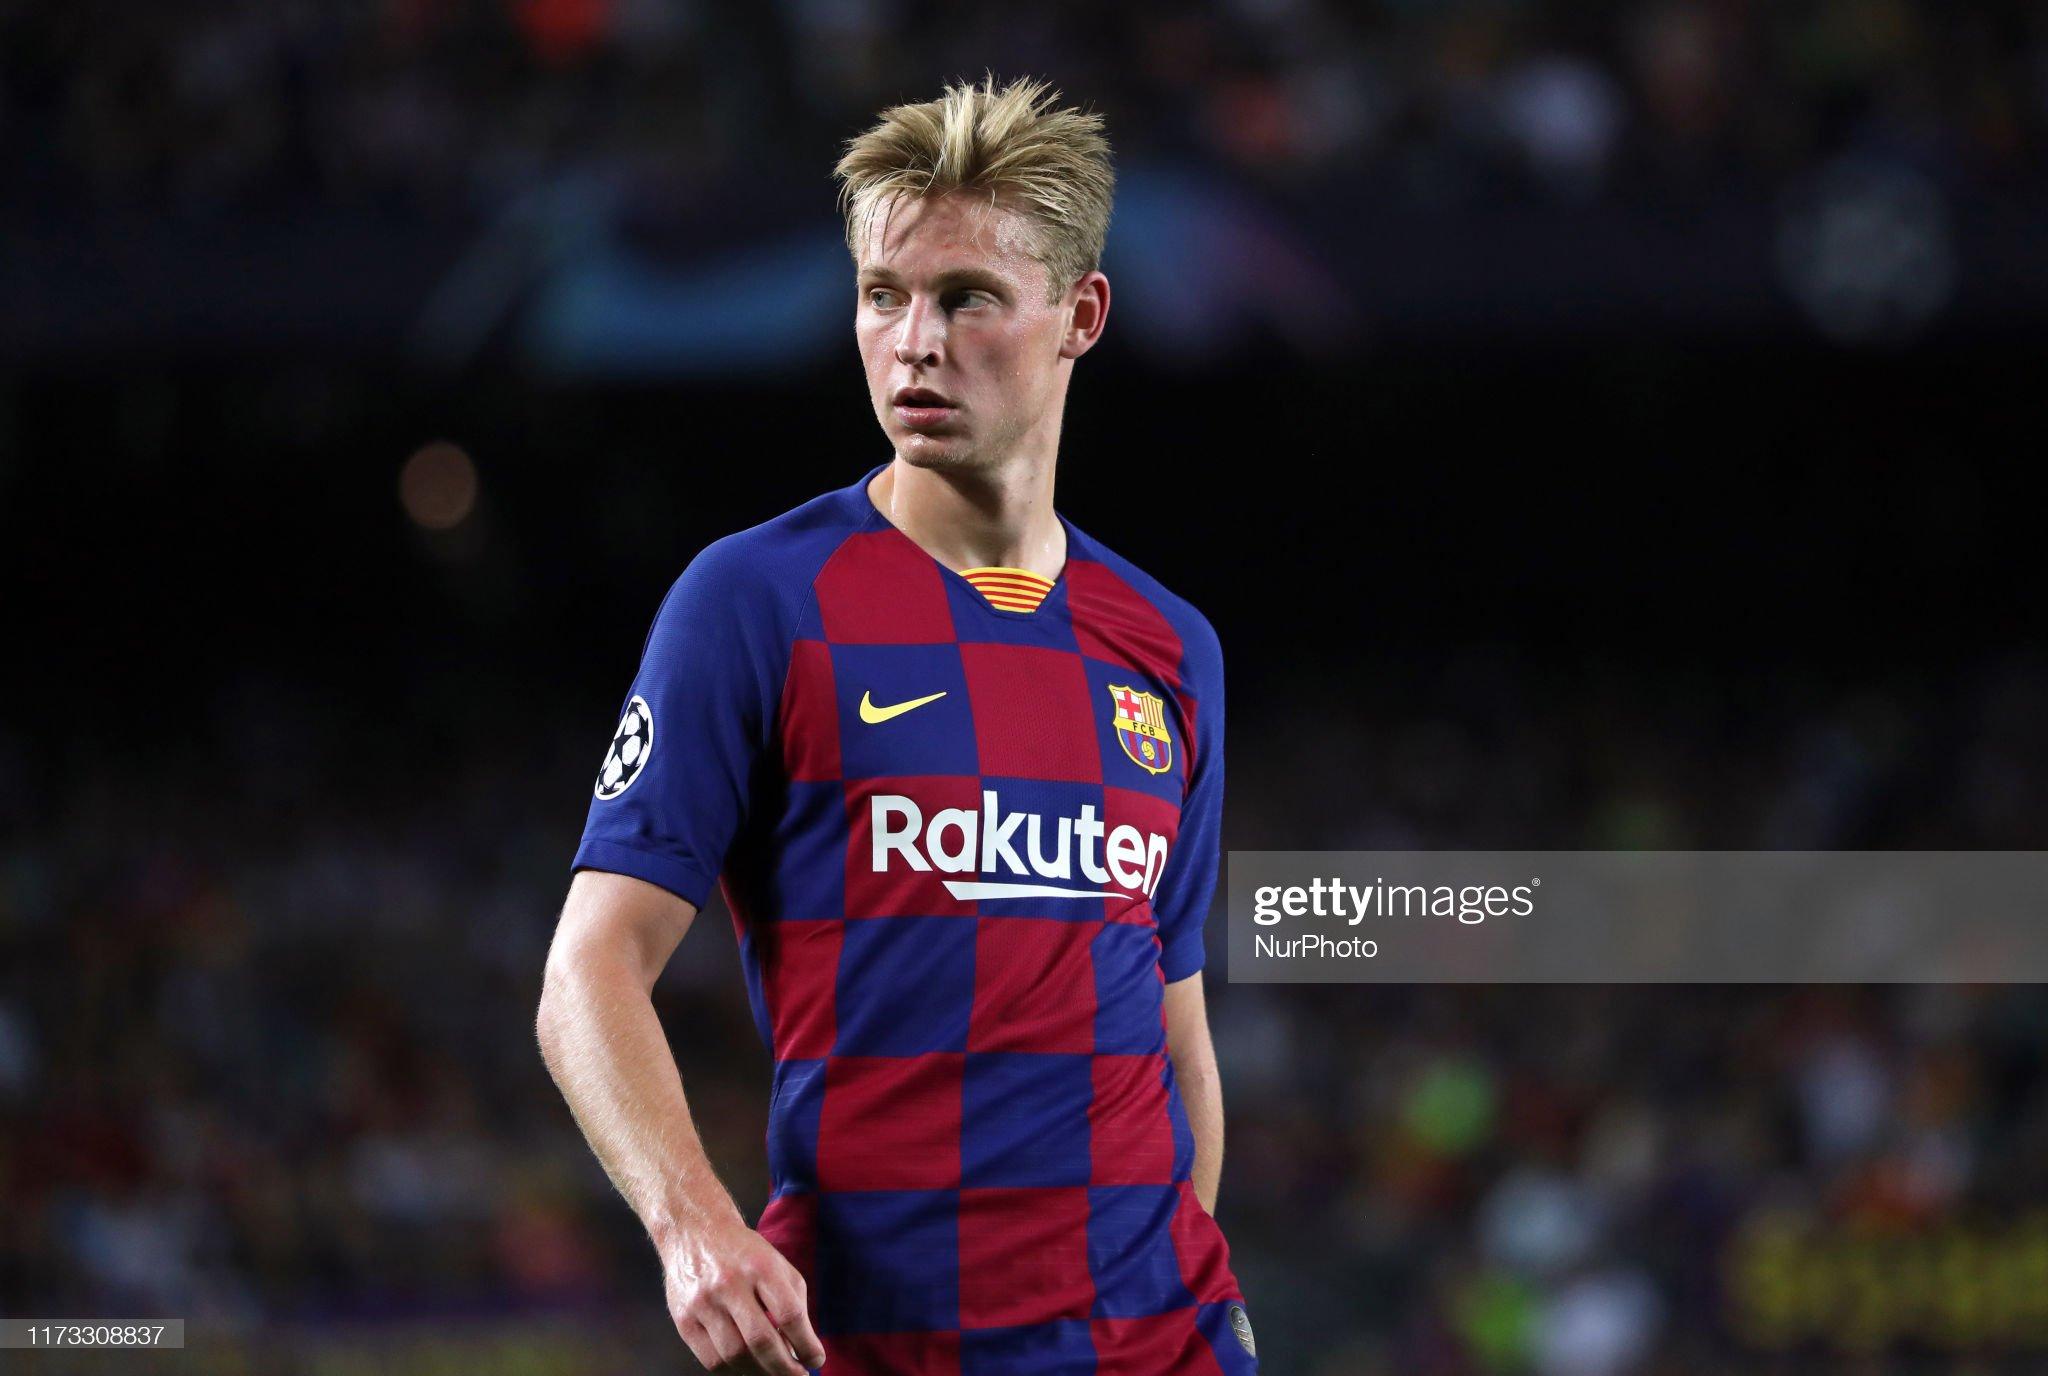 صور مباراة : برشلونة - إنتر 2-1 ( 02-10-2019 )  Frenkie-de-jong-during-the-match-between-fc-barcelona-between-inter-picture-id1173308837?s=2048x2048